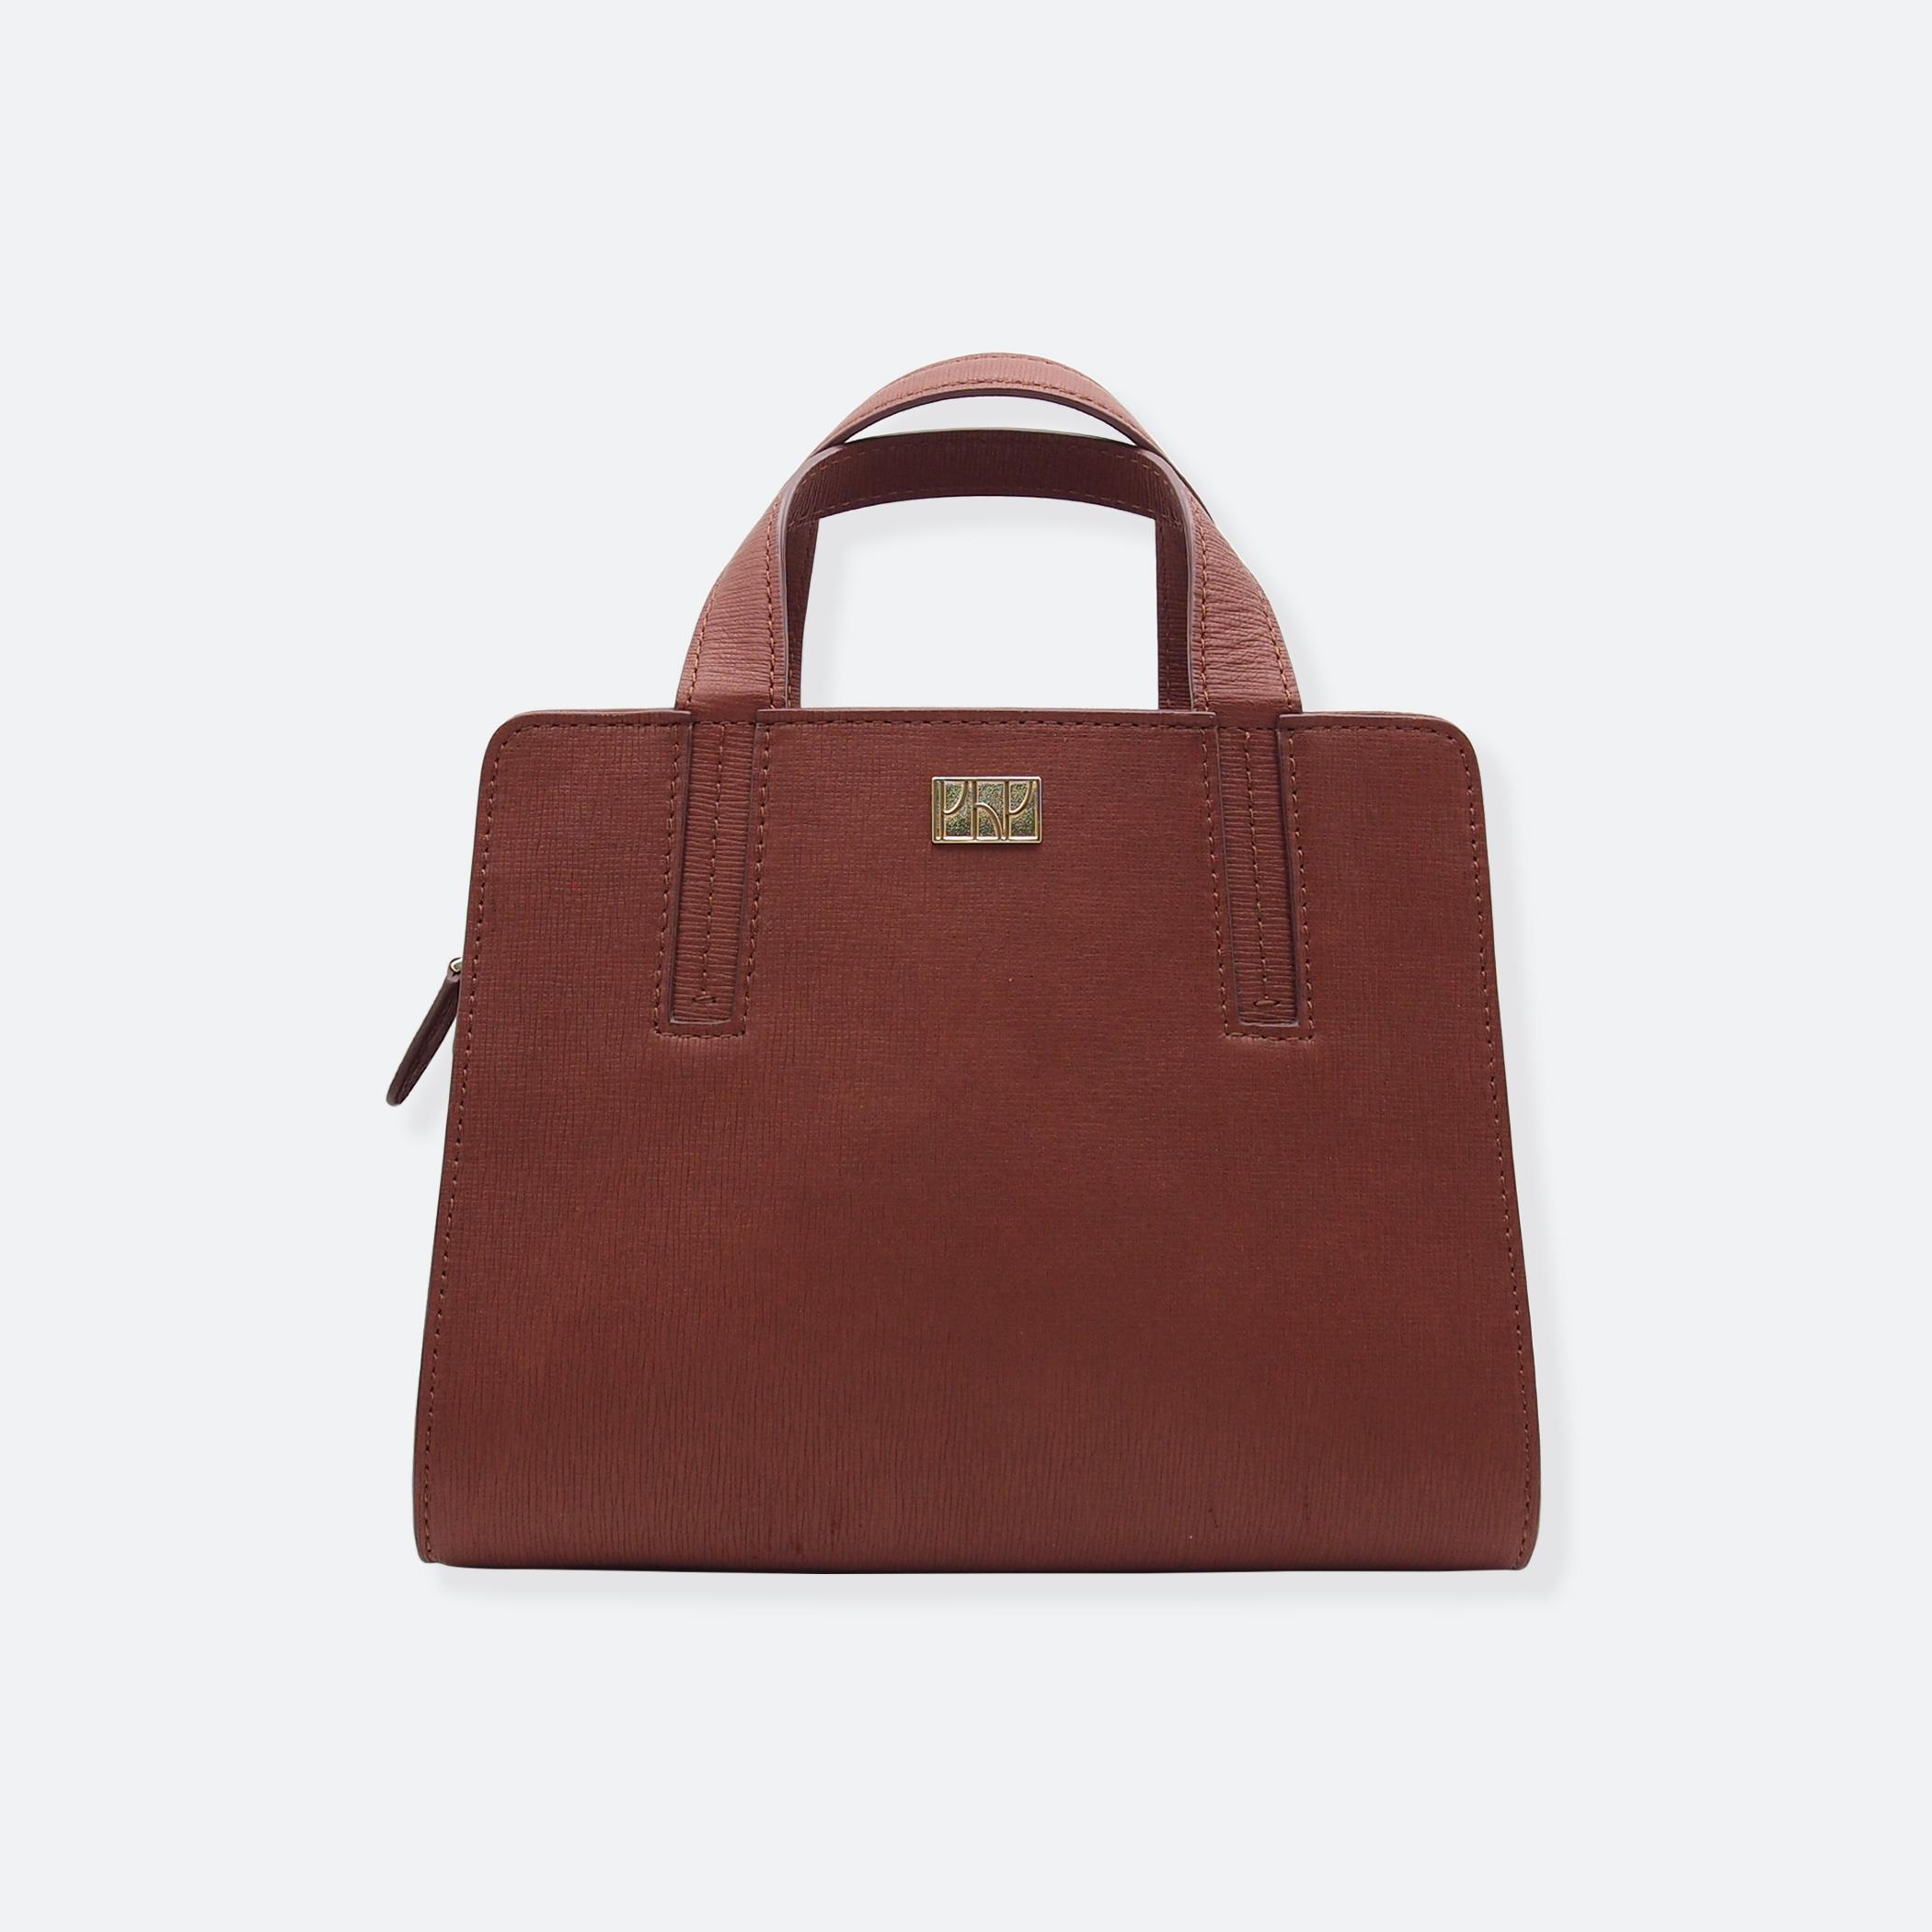 OhMart B043 (Brown) 1